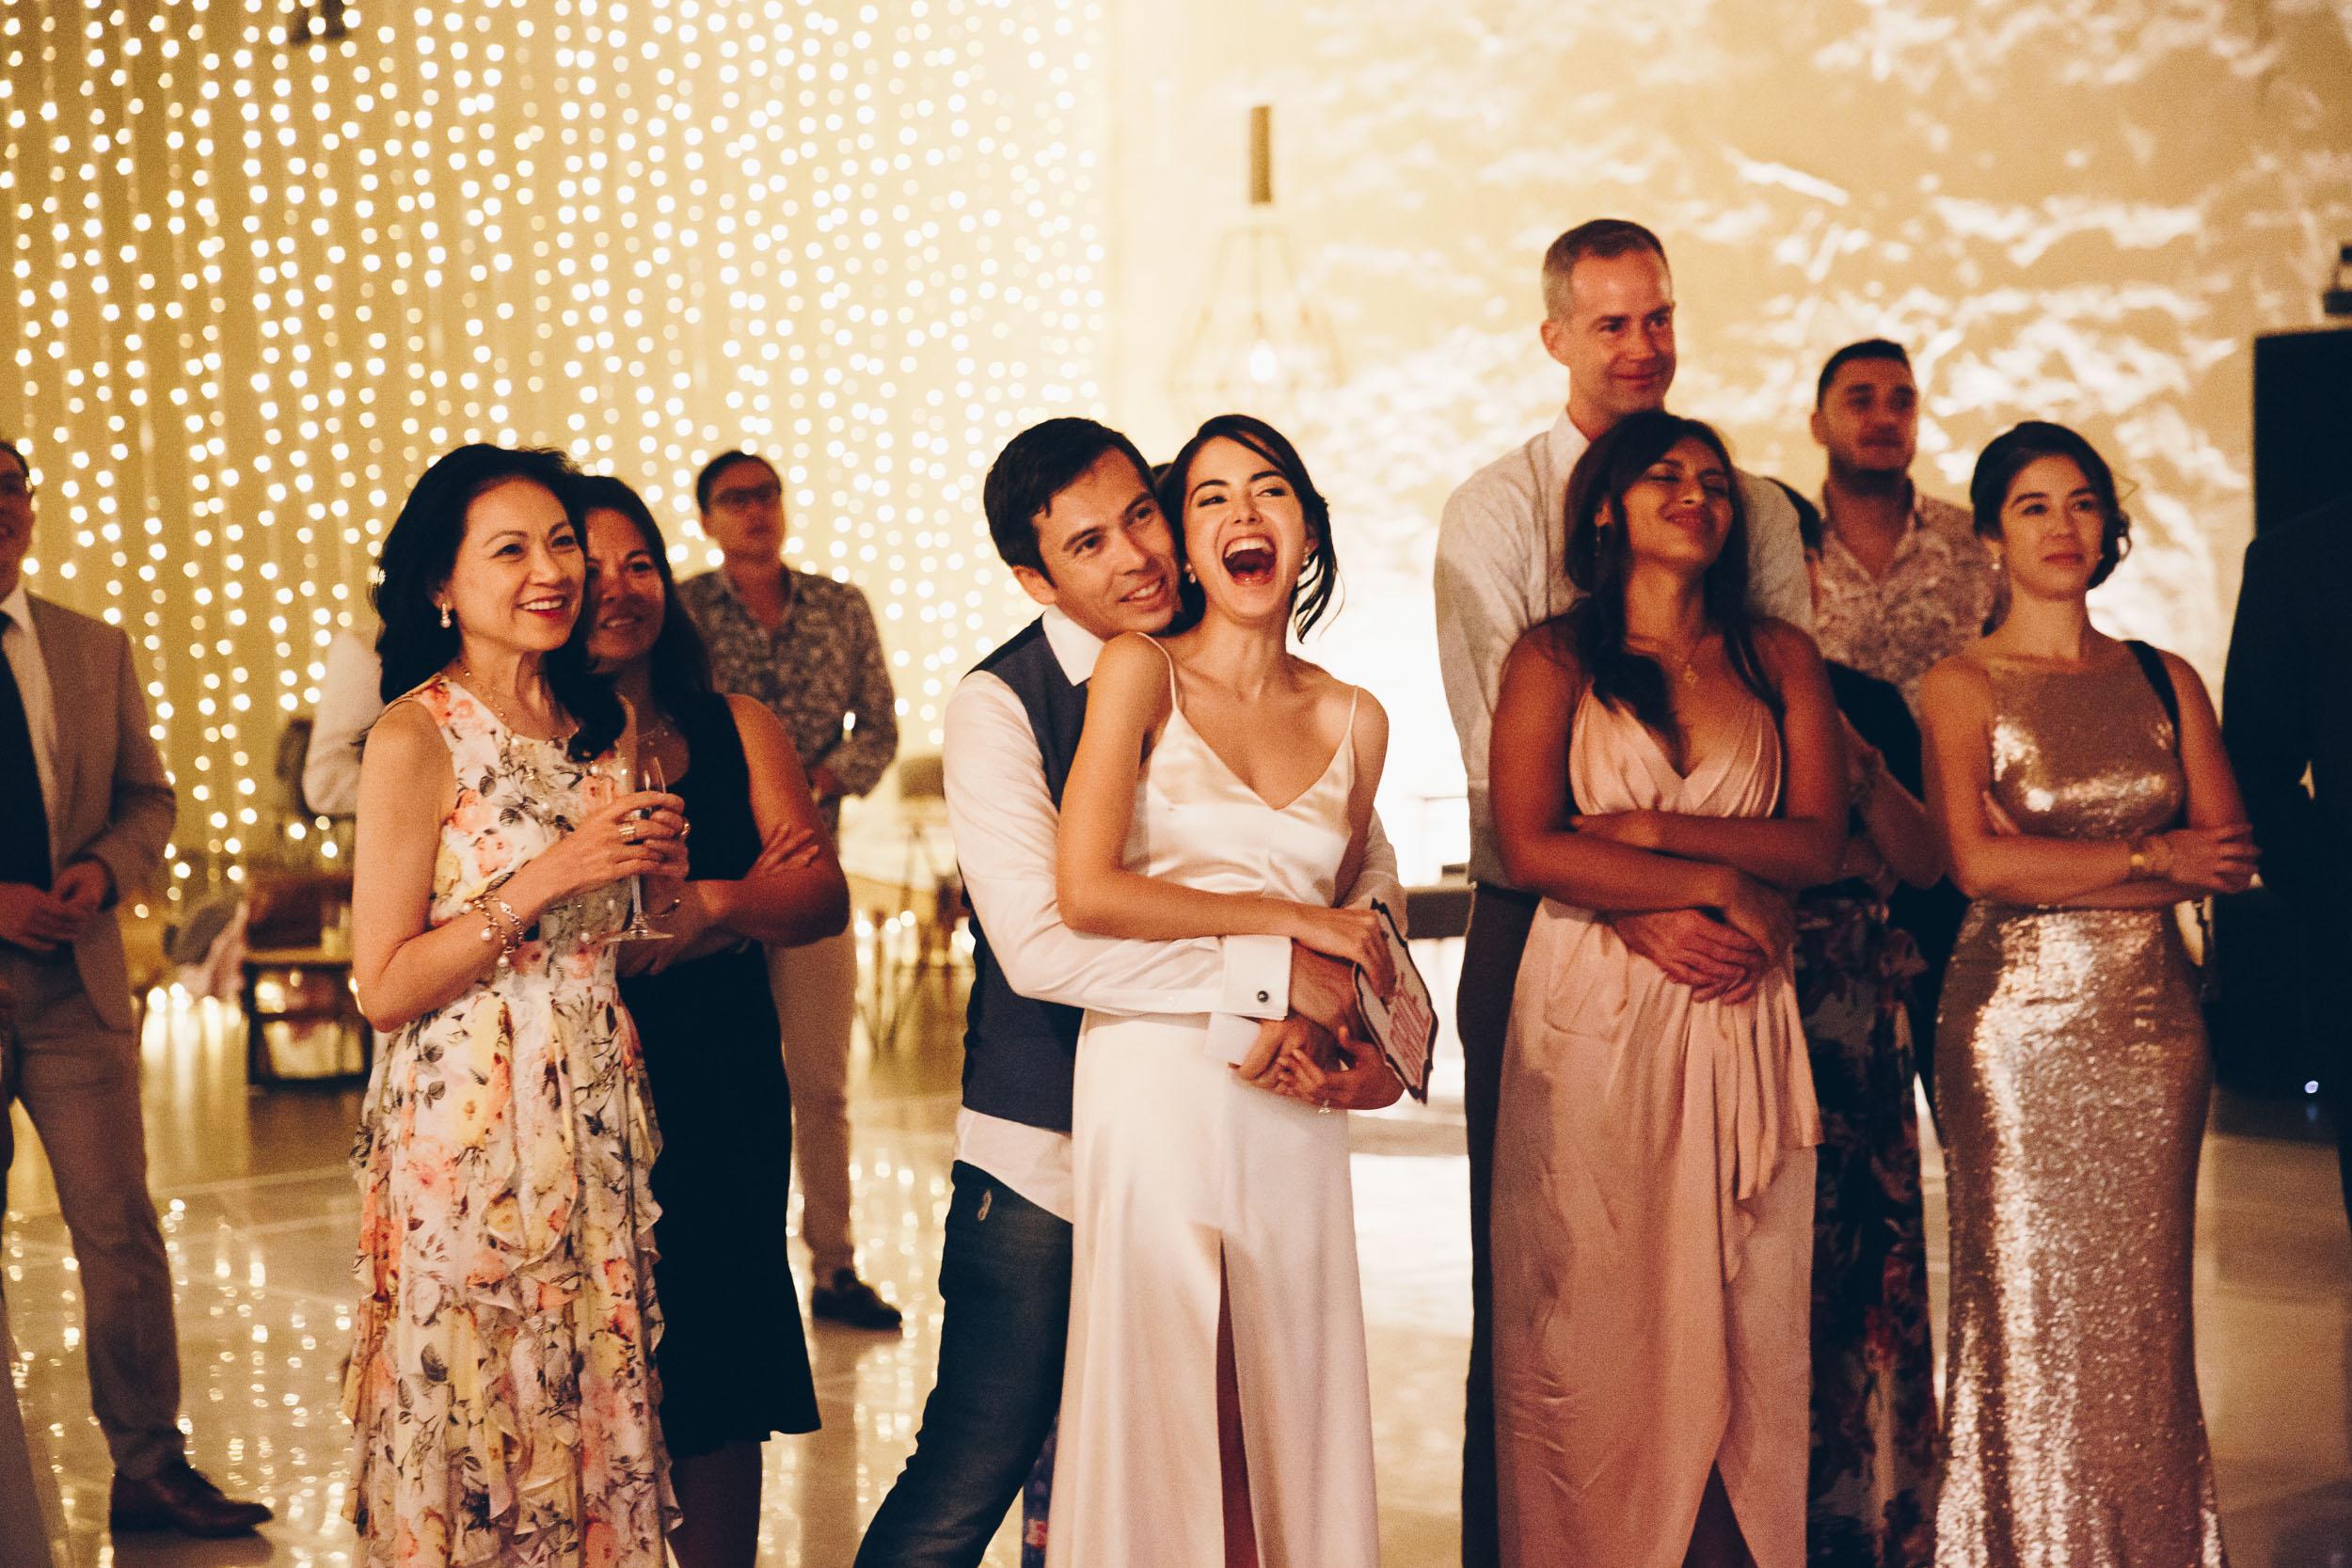 Jenny-Rockett-John-Scranton-Cape-Town-Wedding-Photographer-Andrea-Kellan-237.jpg